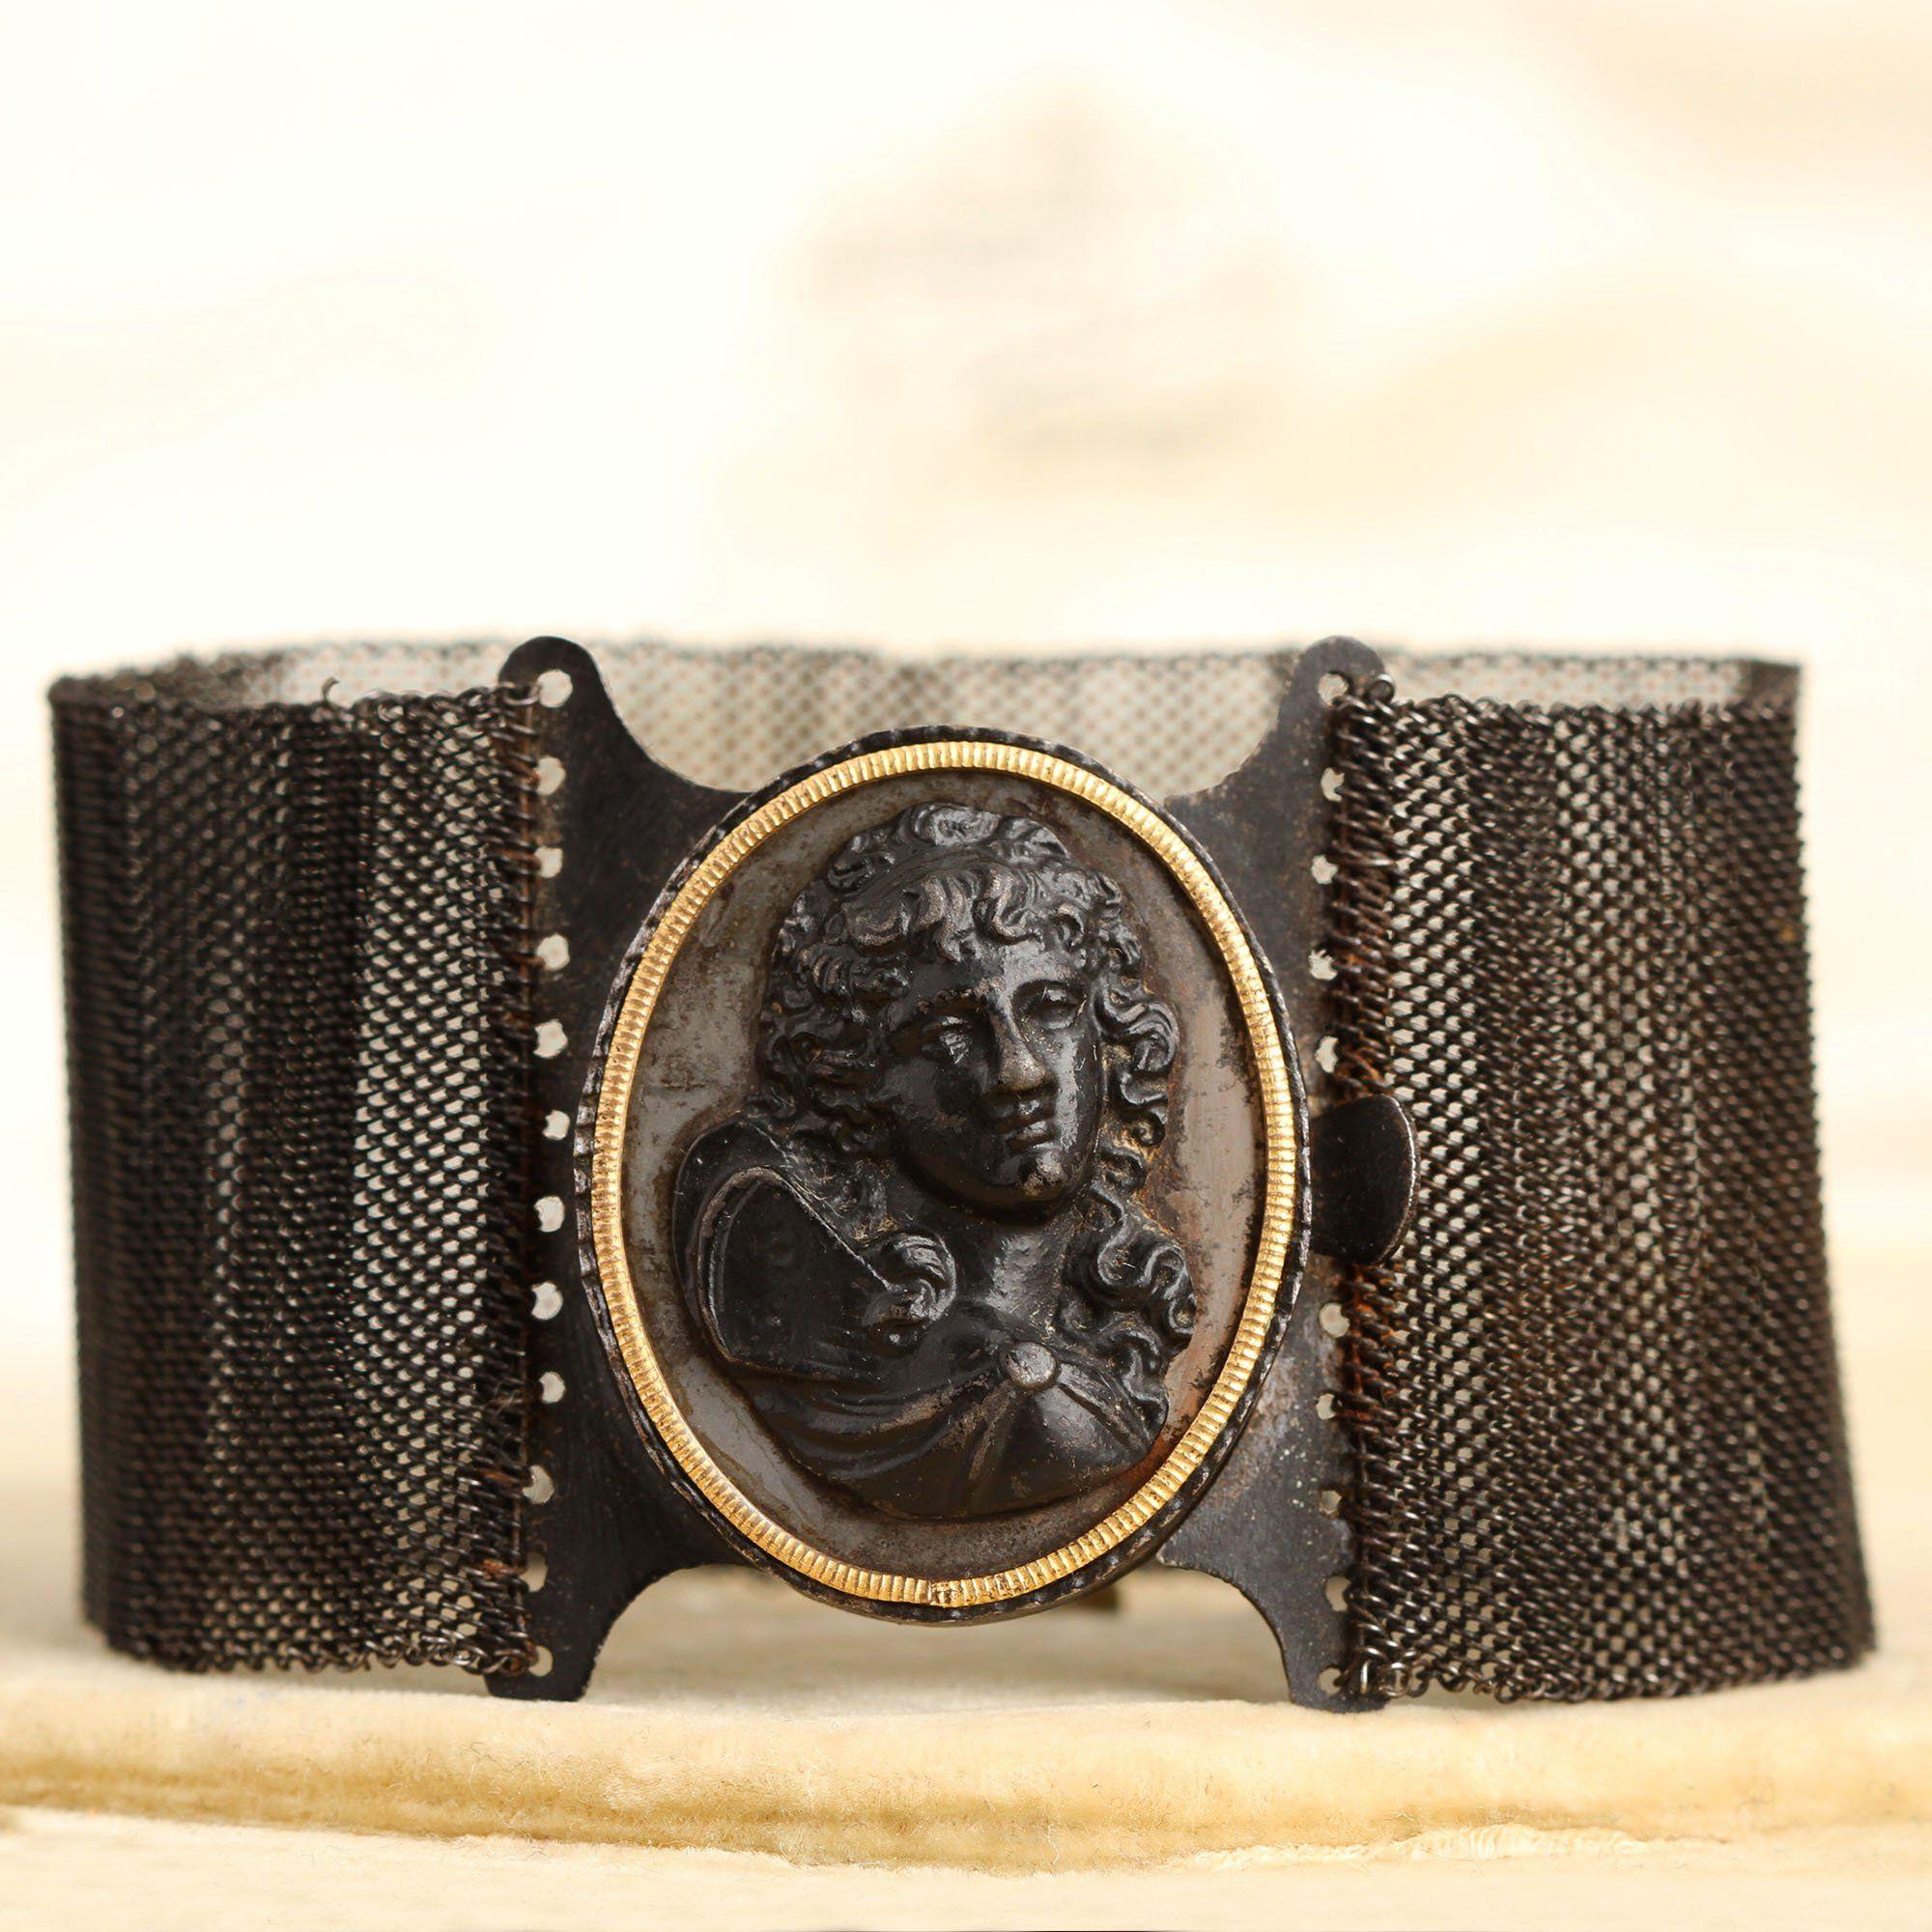 Berlin Iron Bracelet with Eros Centocelle Cameo